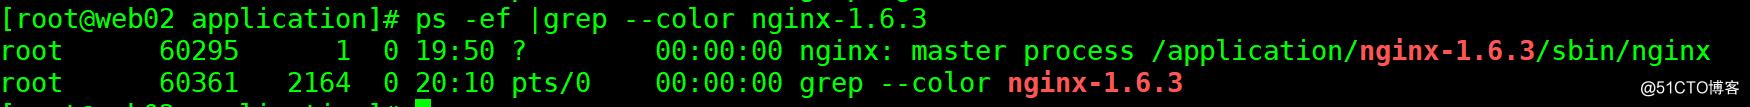 nginx 基础的安装部署和依赖包